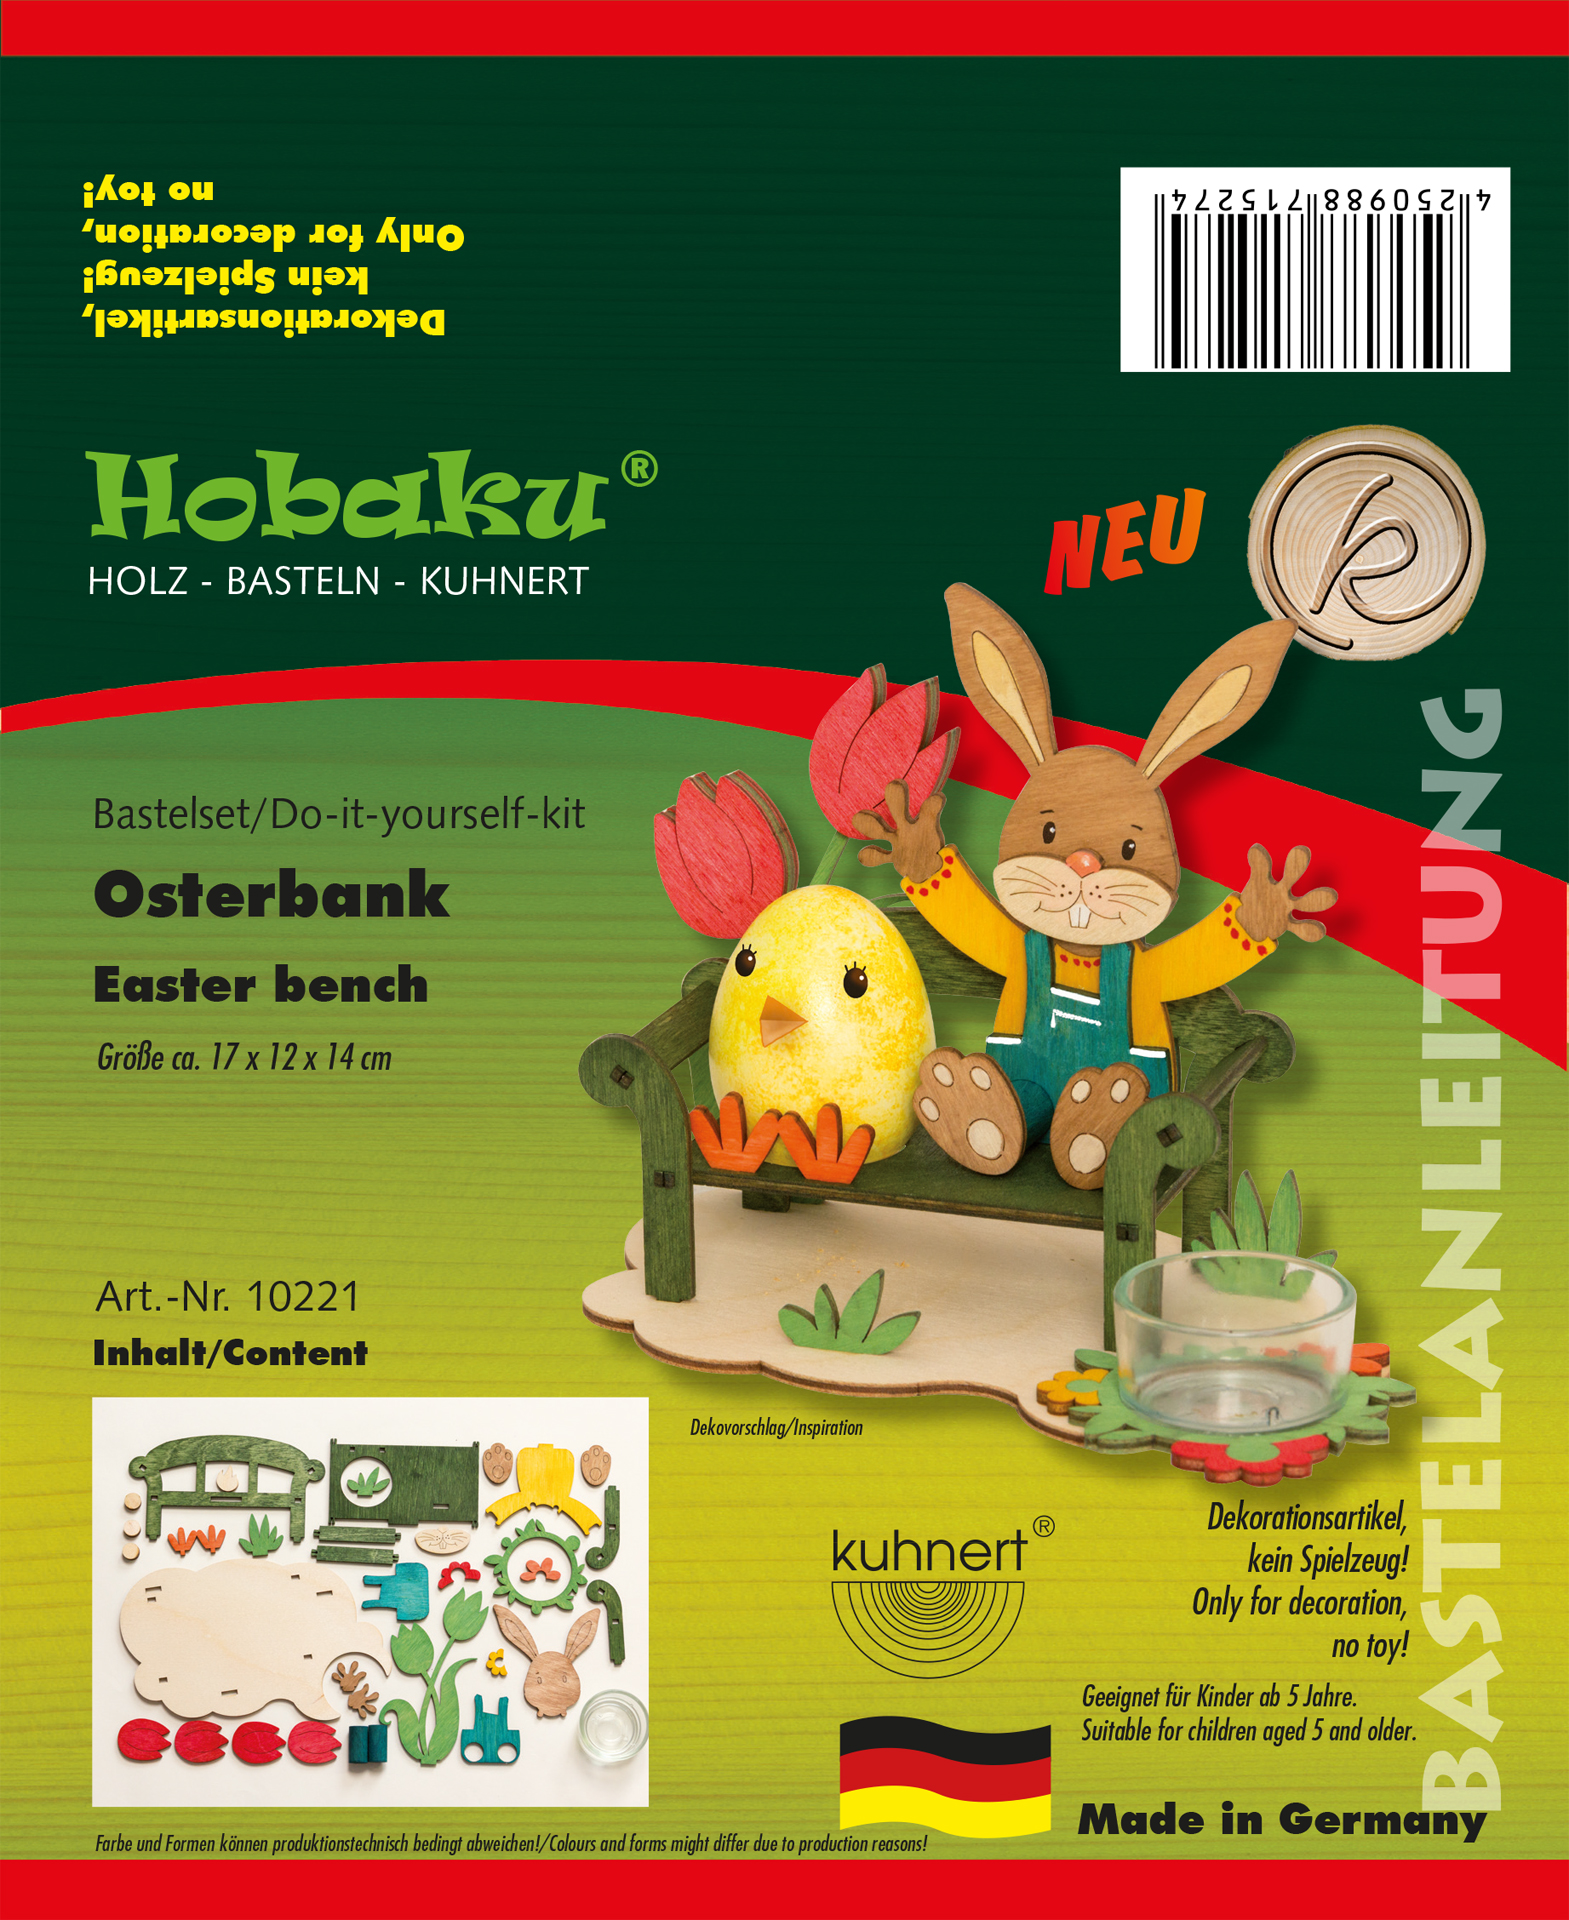 Bastelset Osterbank mit Hase